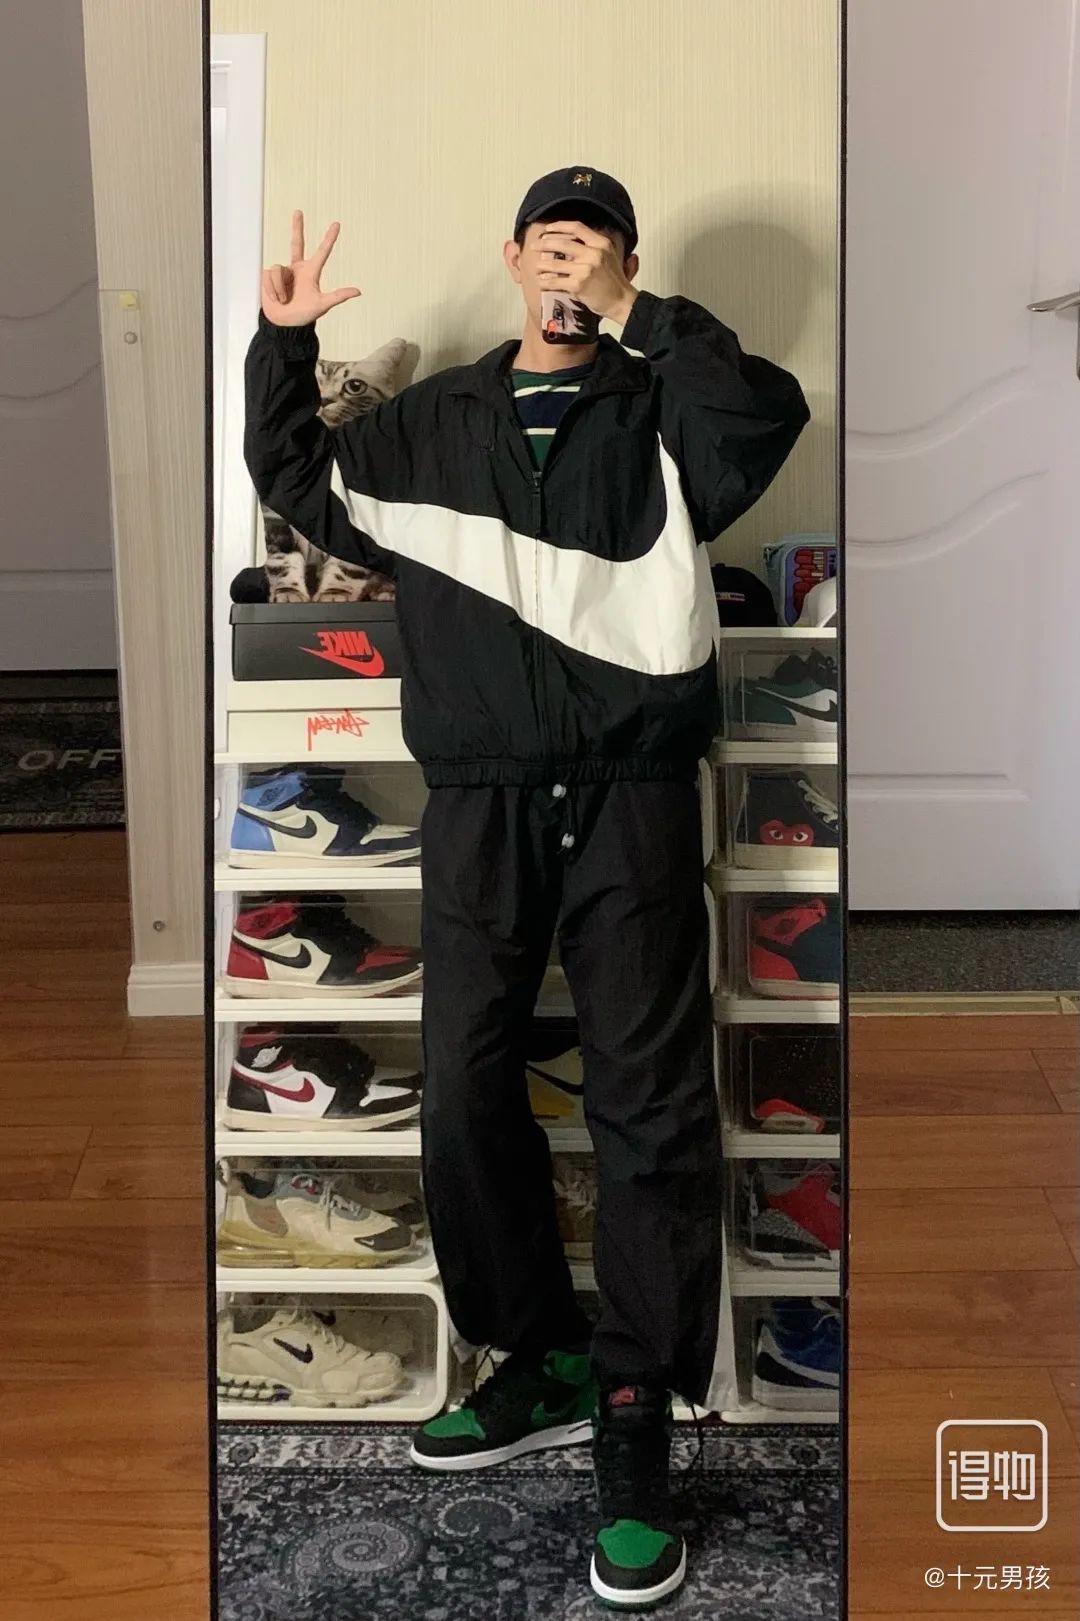 Nike 大钩子夹克外套真假对比避免踩雷!